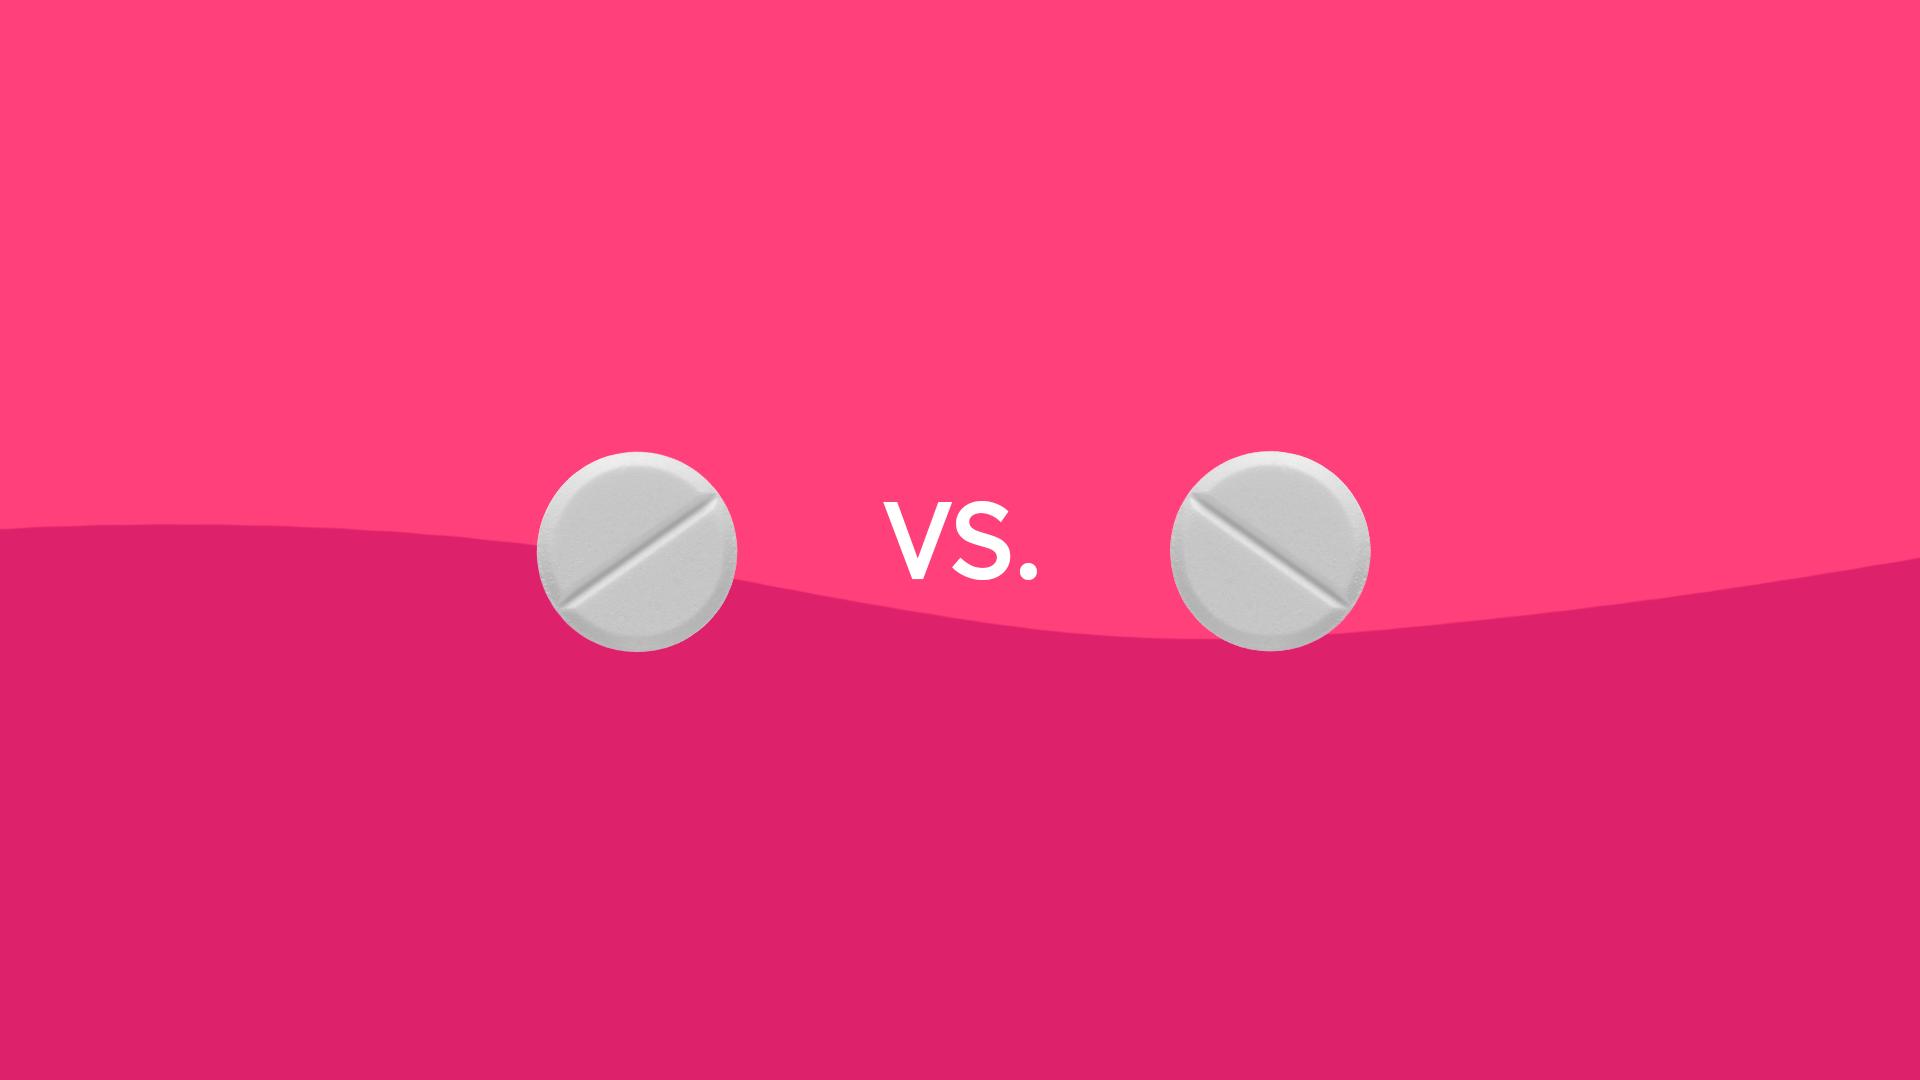 Arimidex vs Aromasin: Main Differences and Similarities